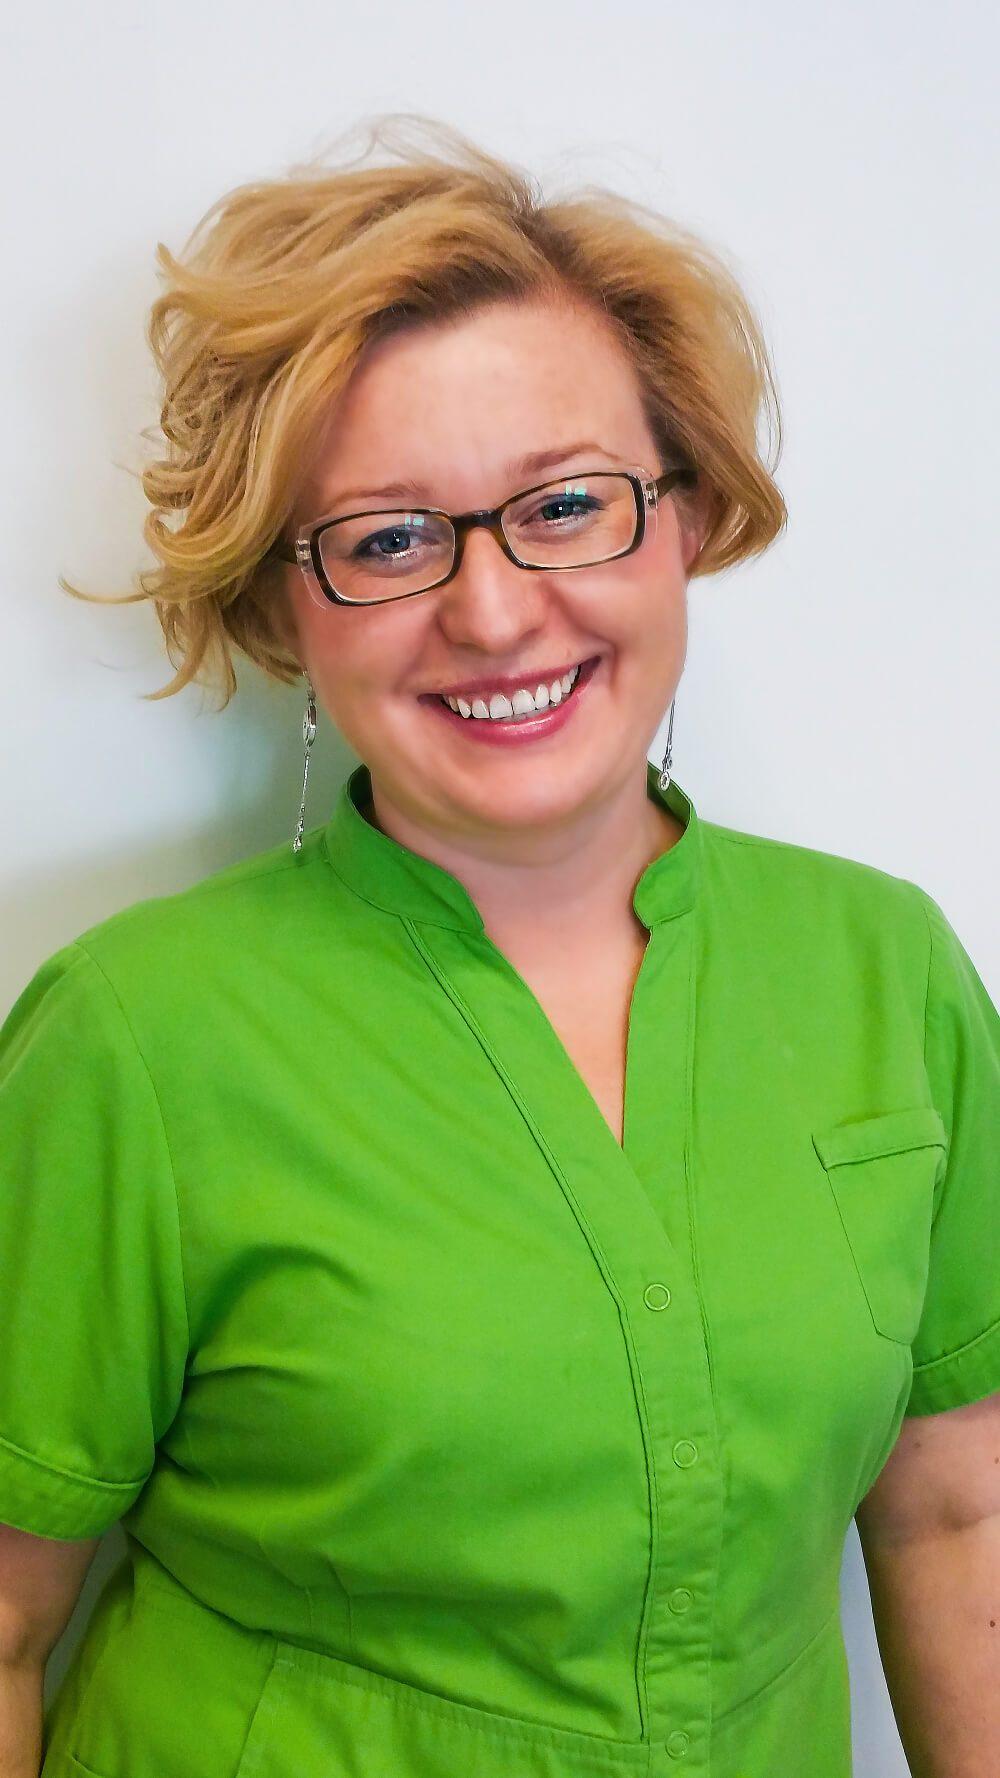 Mrs. Monika Kocol-Chudzia